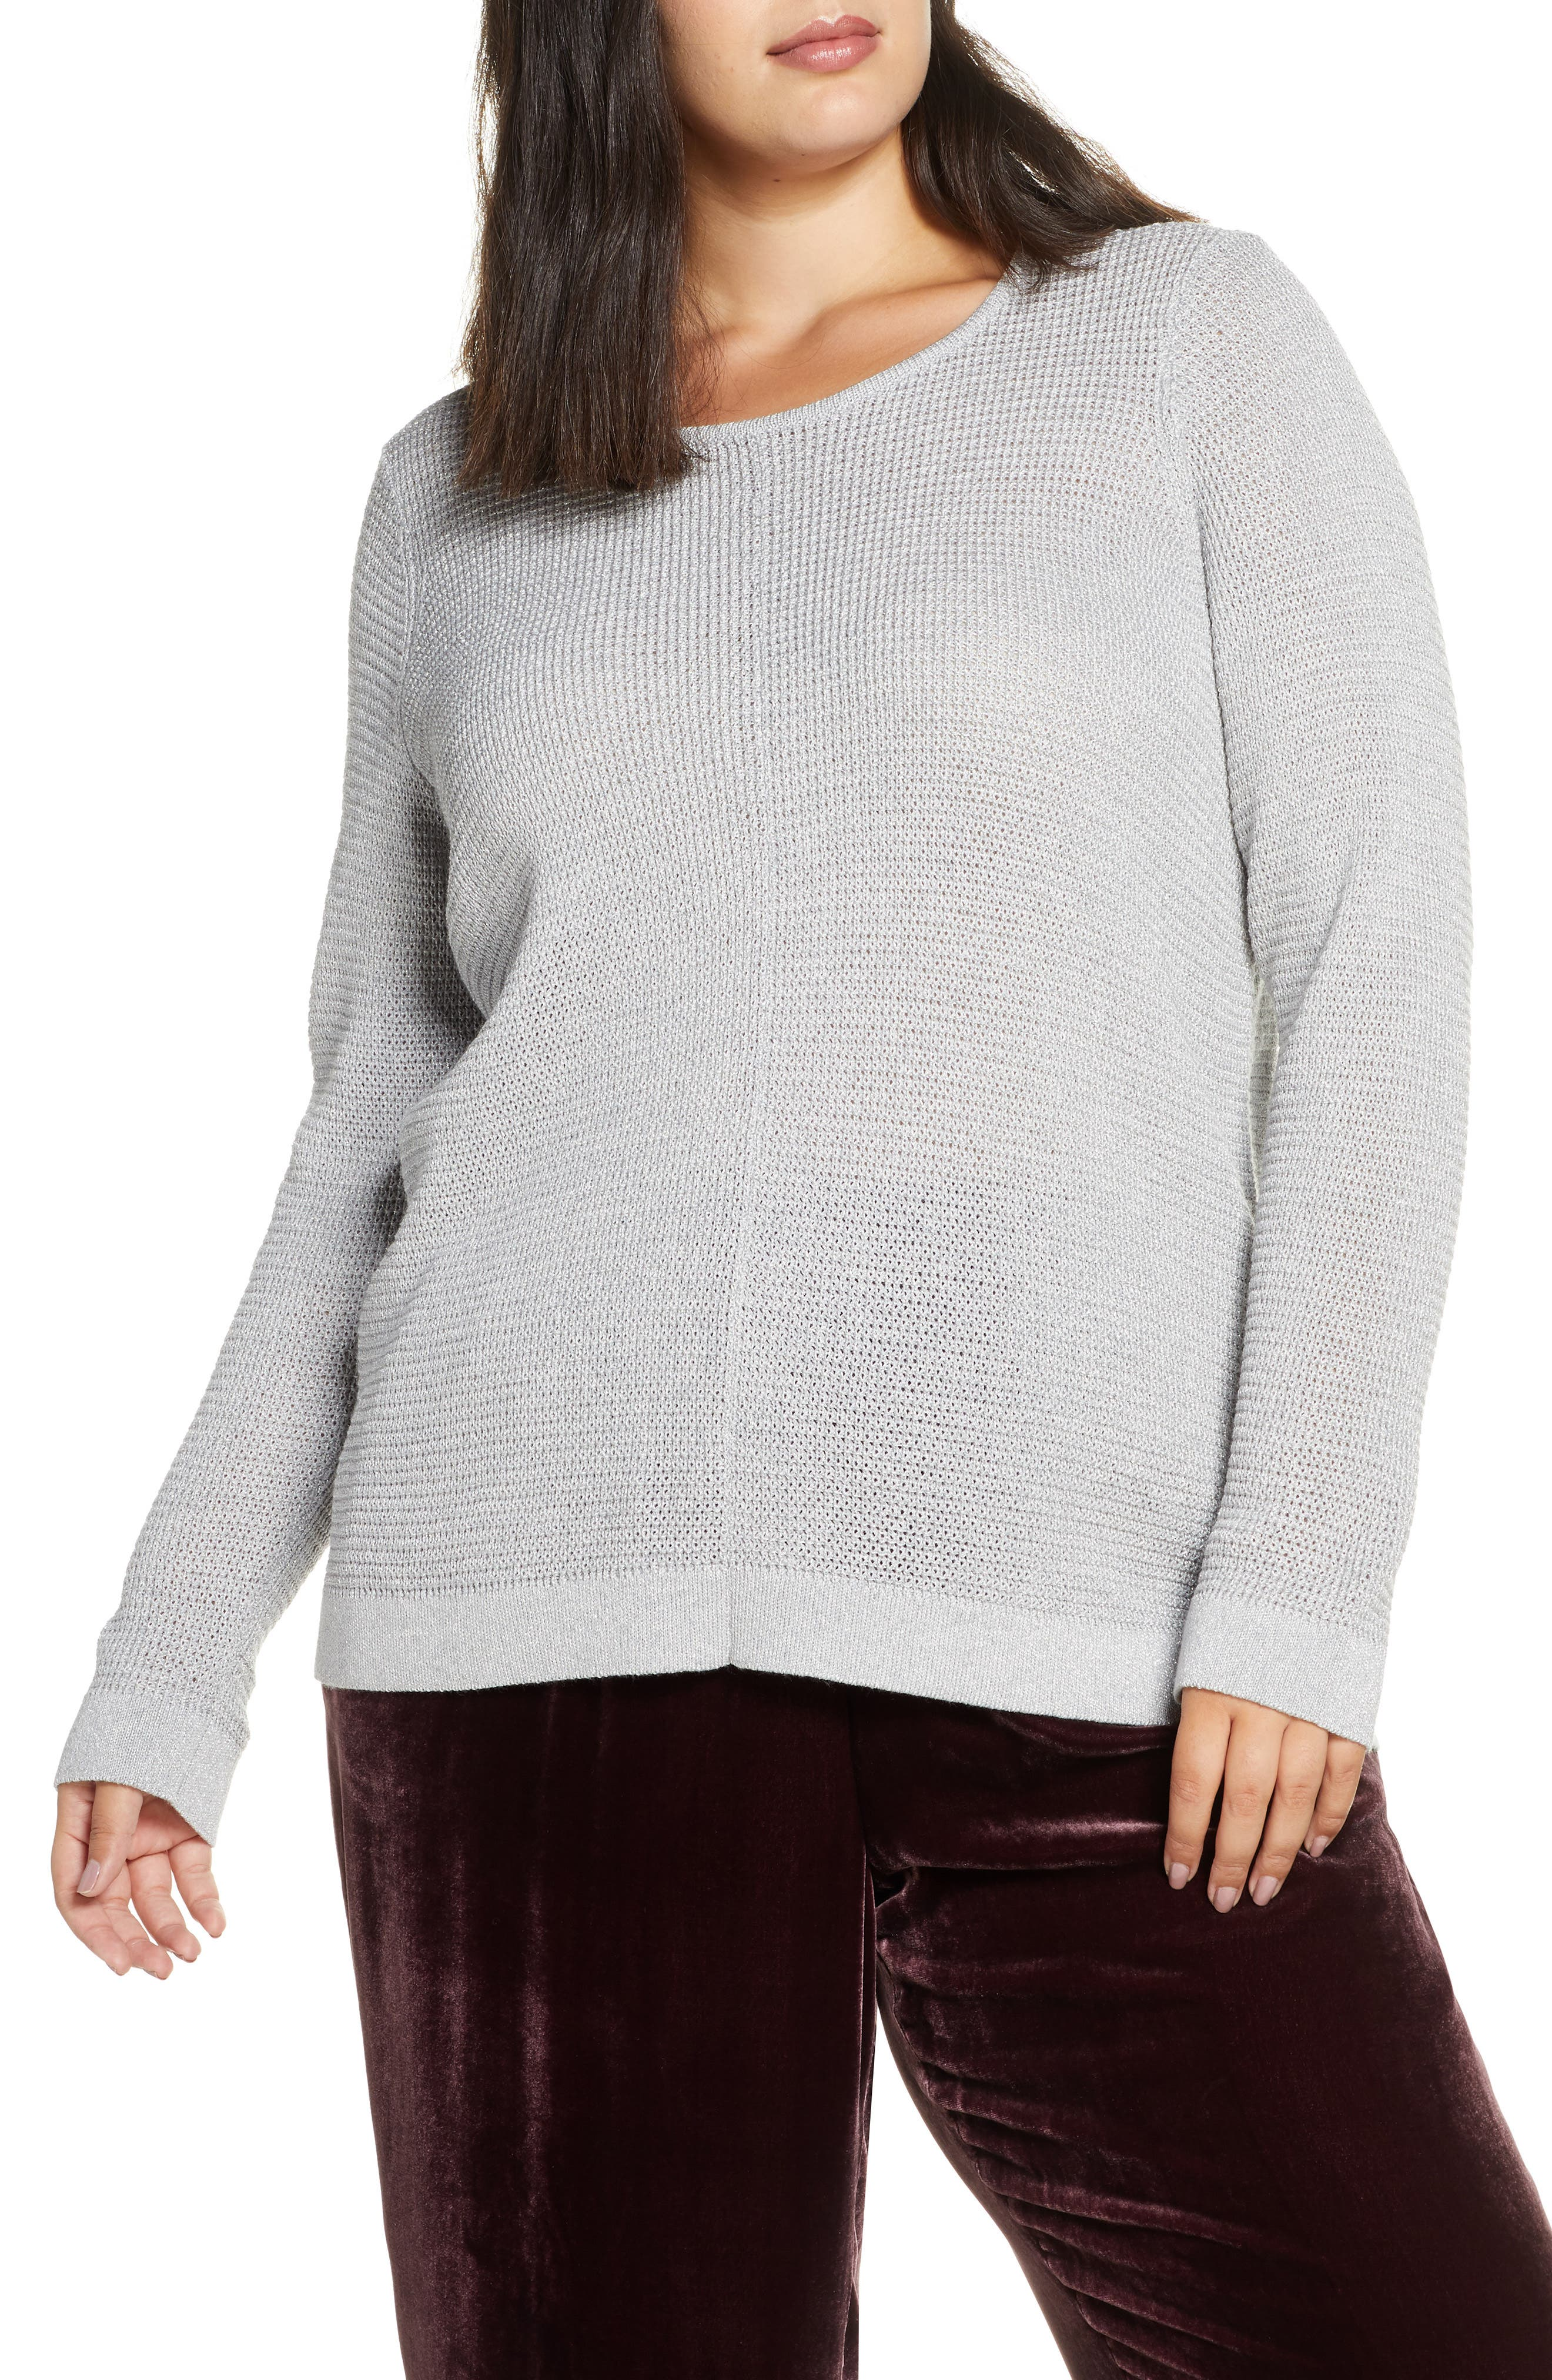 Eileen Fisher Tops Shimmer Merino Wool Blend Top